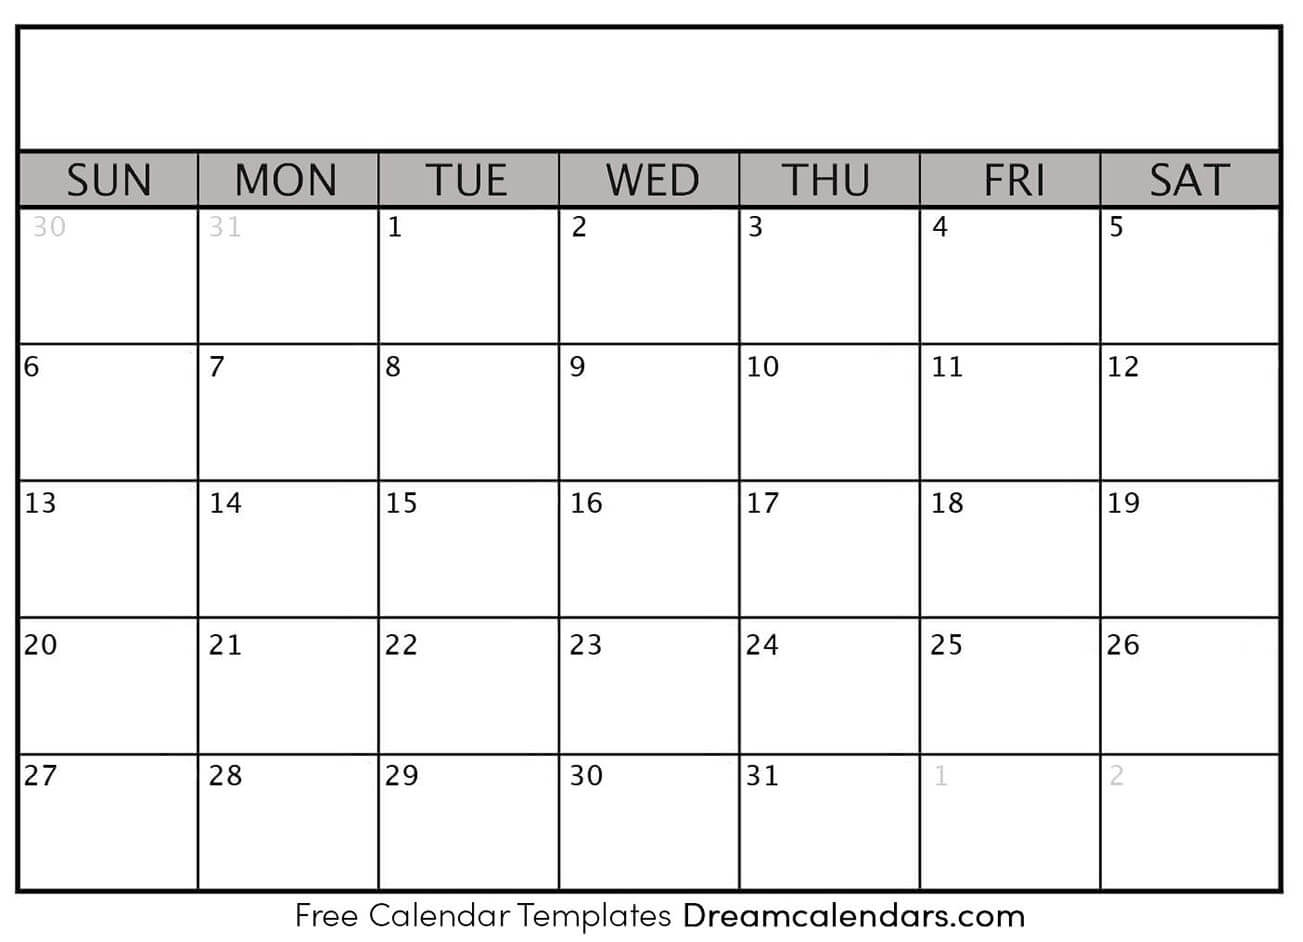 Printable Blank Calendar 2020 | Dream Calendars pertaining to Blank Fill In Calendar 2020